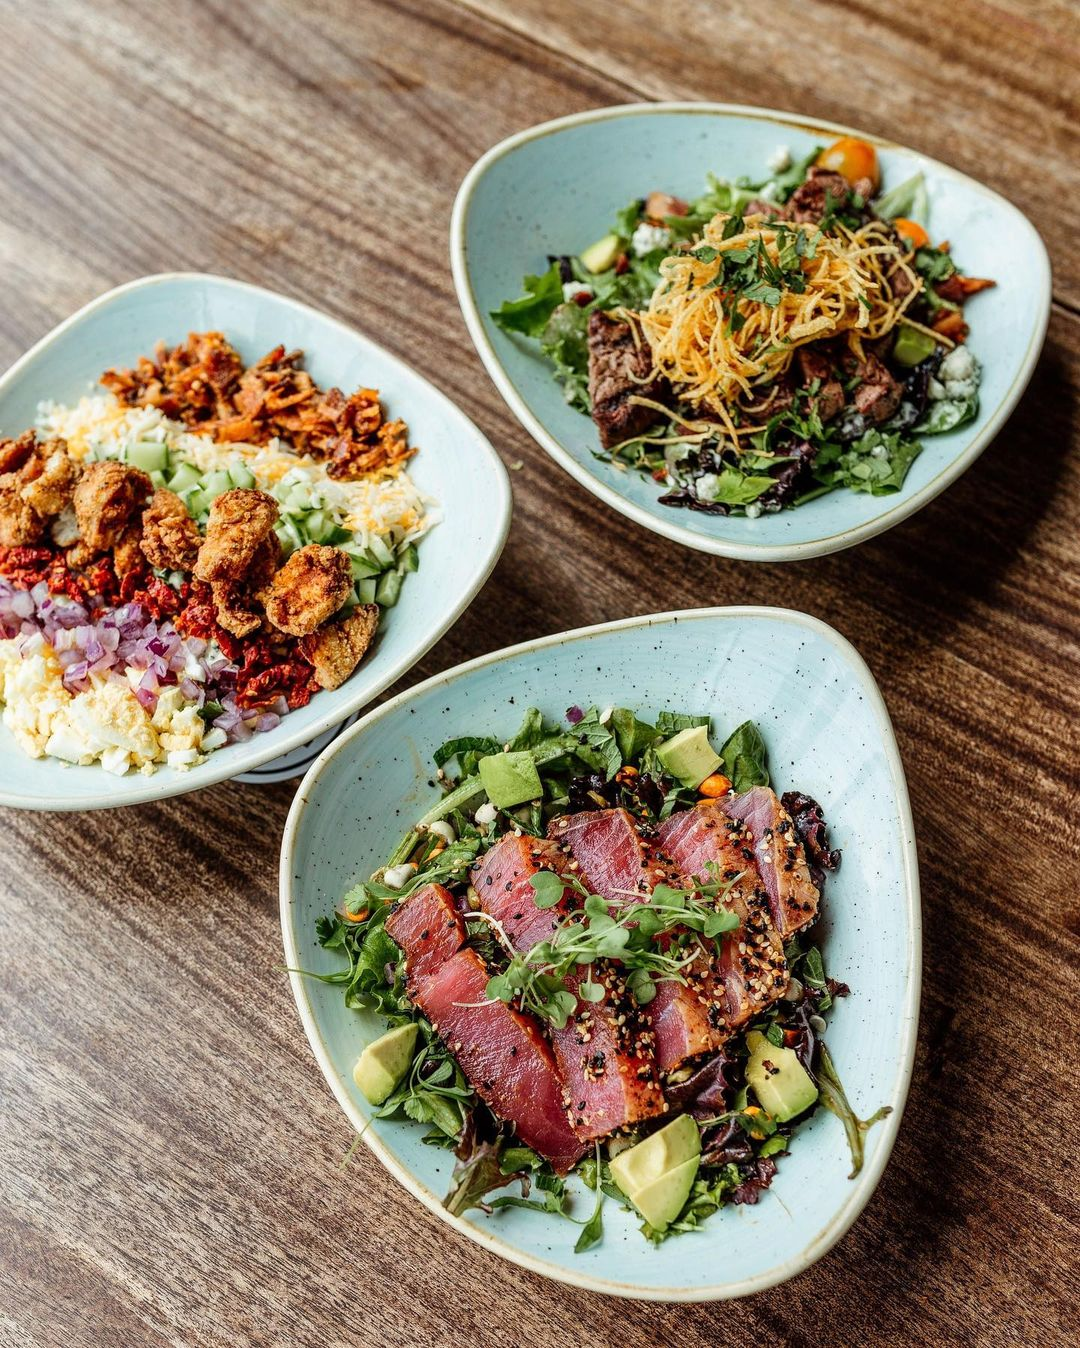 Stirr Dallas salad